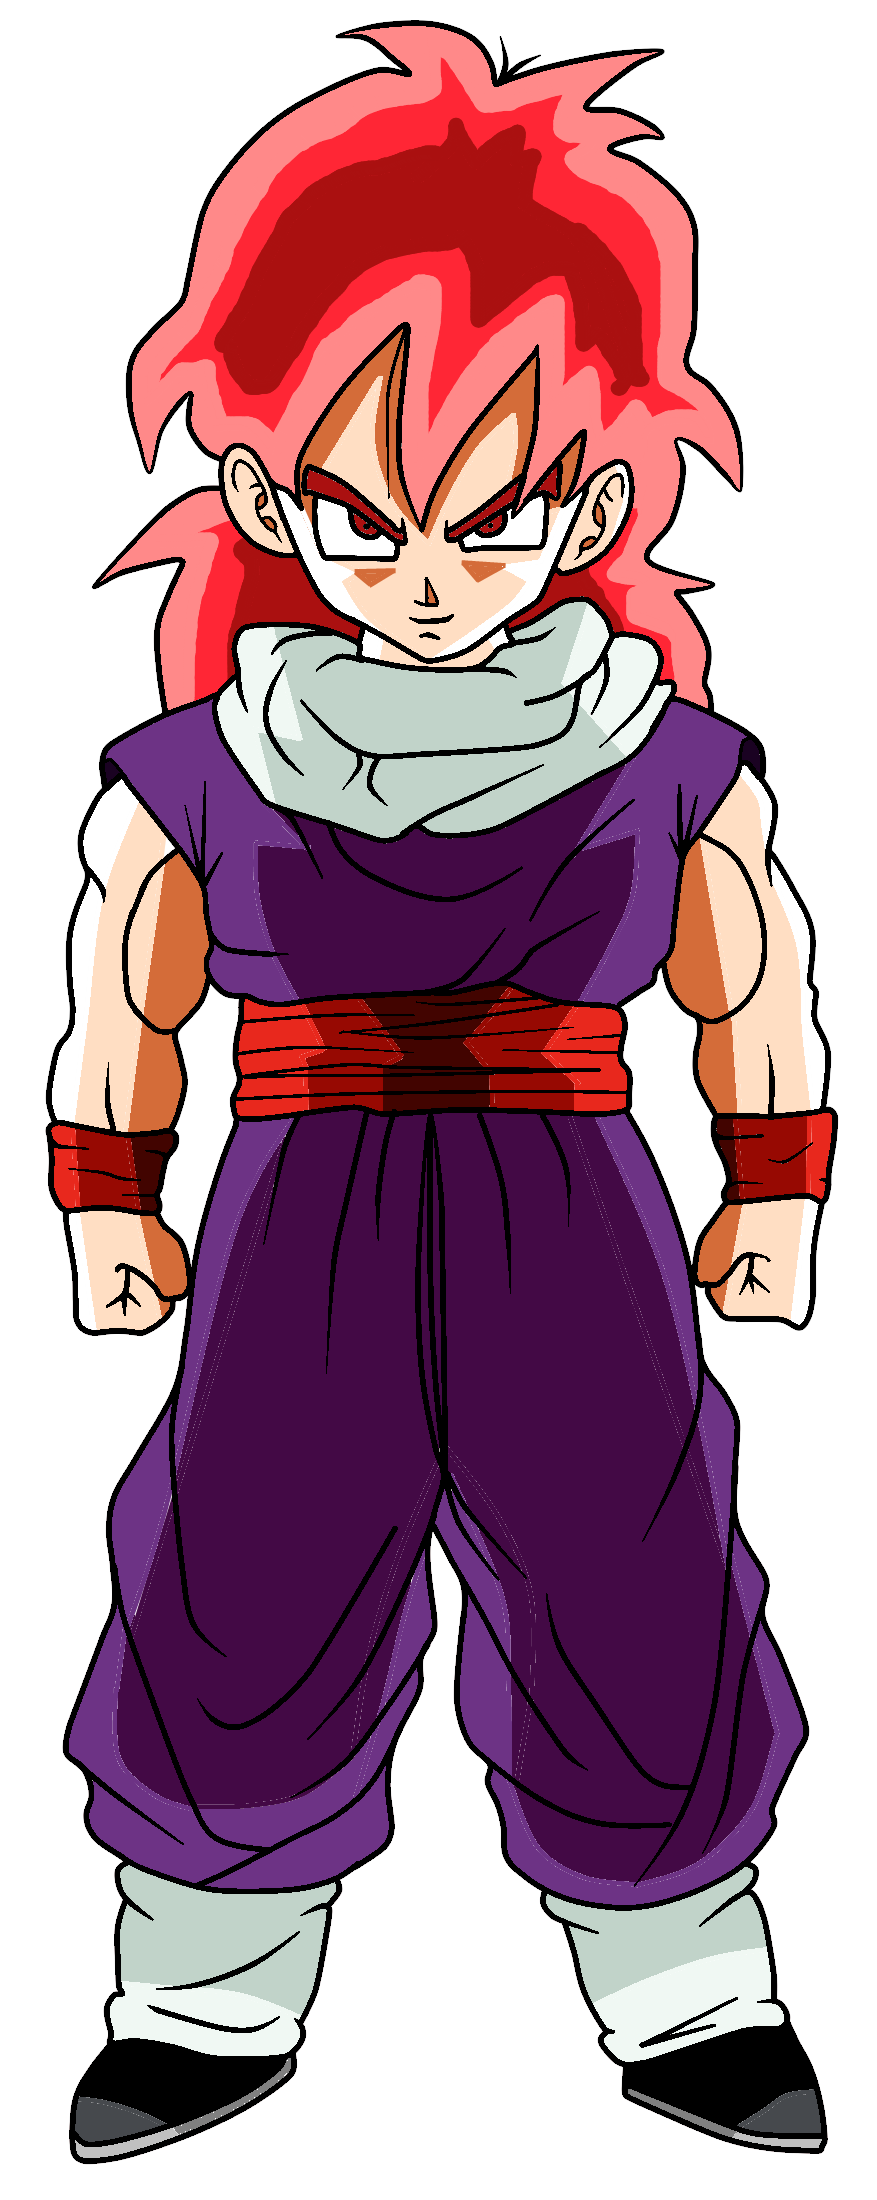 Super Saiyan God Gohan by RioluLucarioFan9000 on DeviantArt